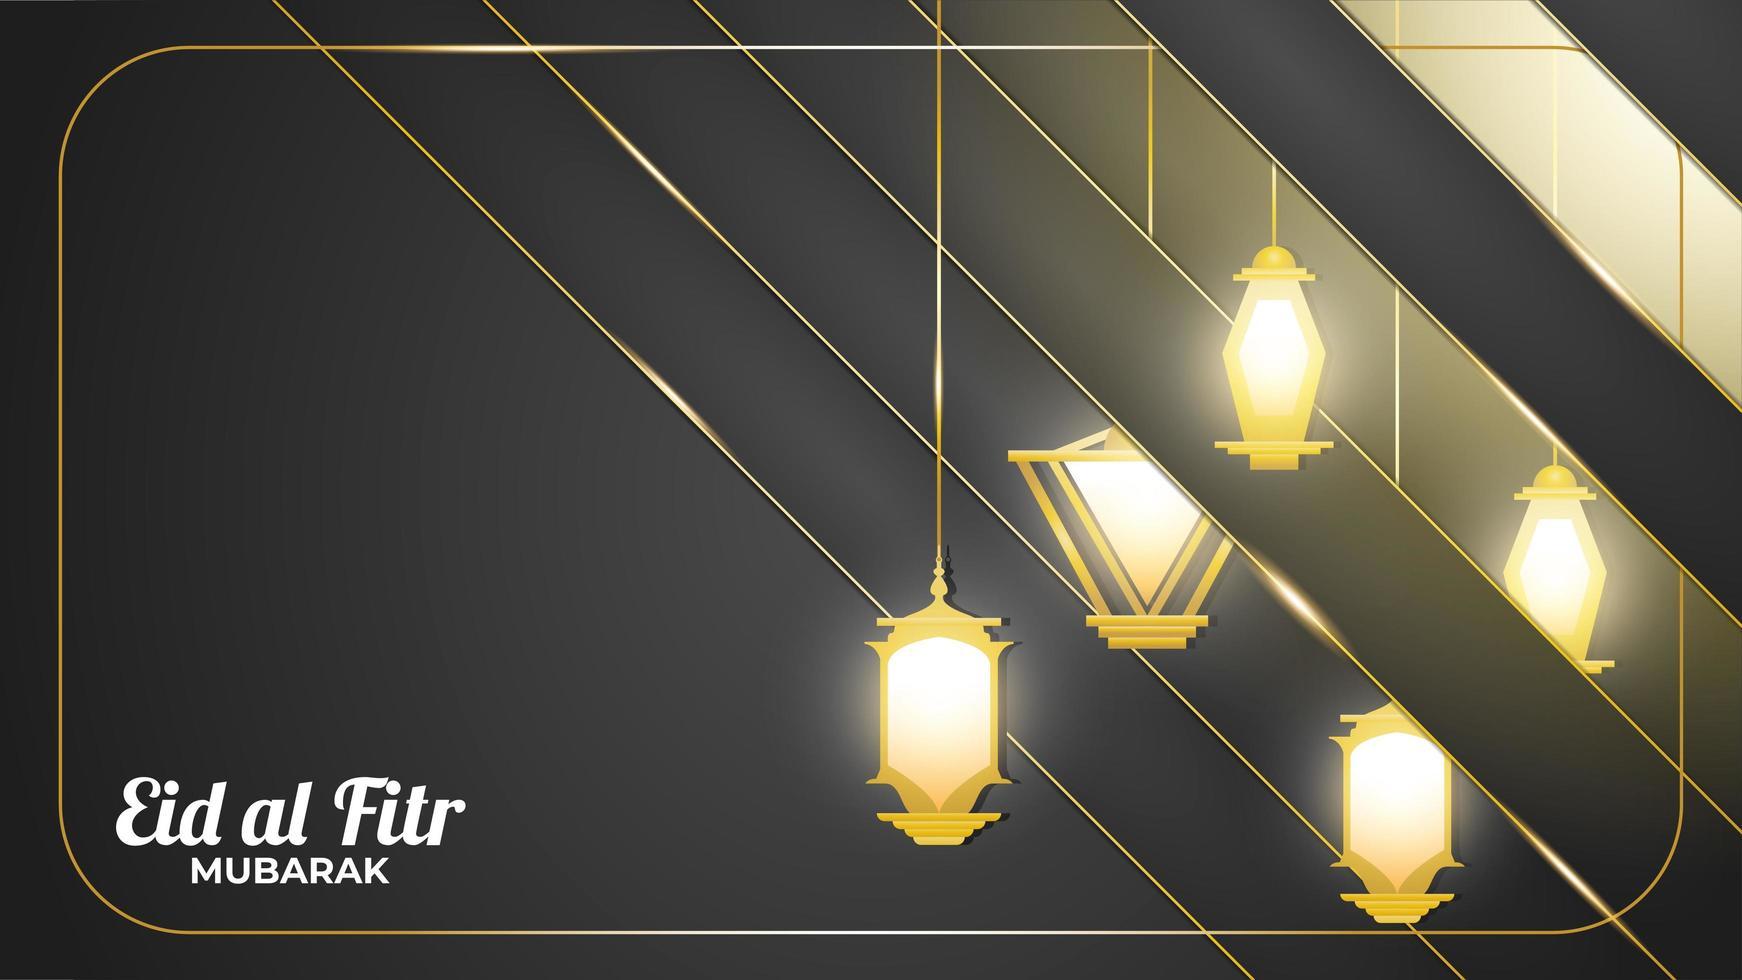 eid mubarak banner con lanterne d'oro vettore